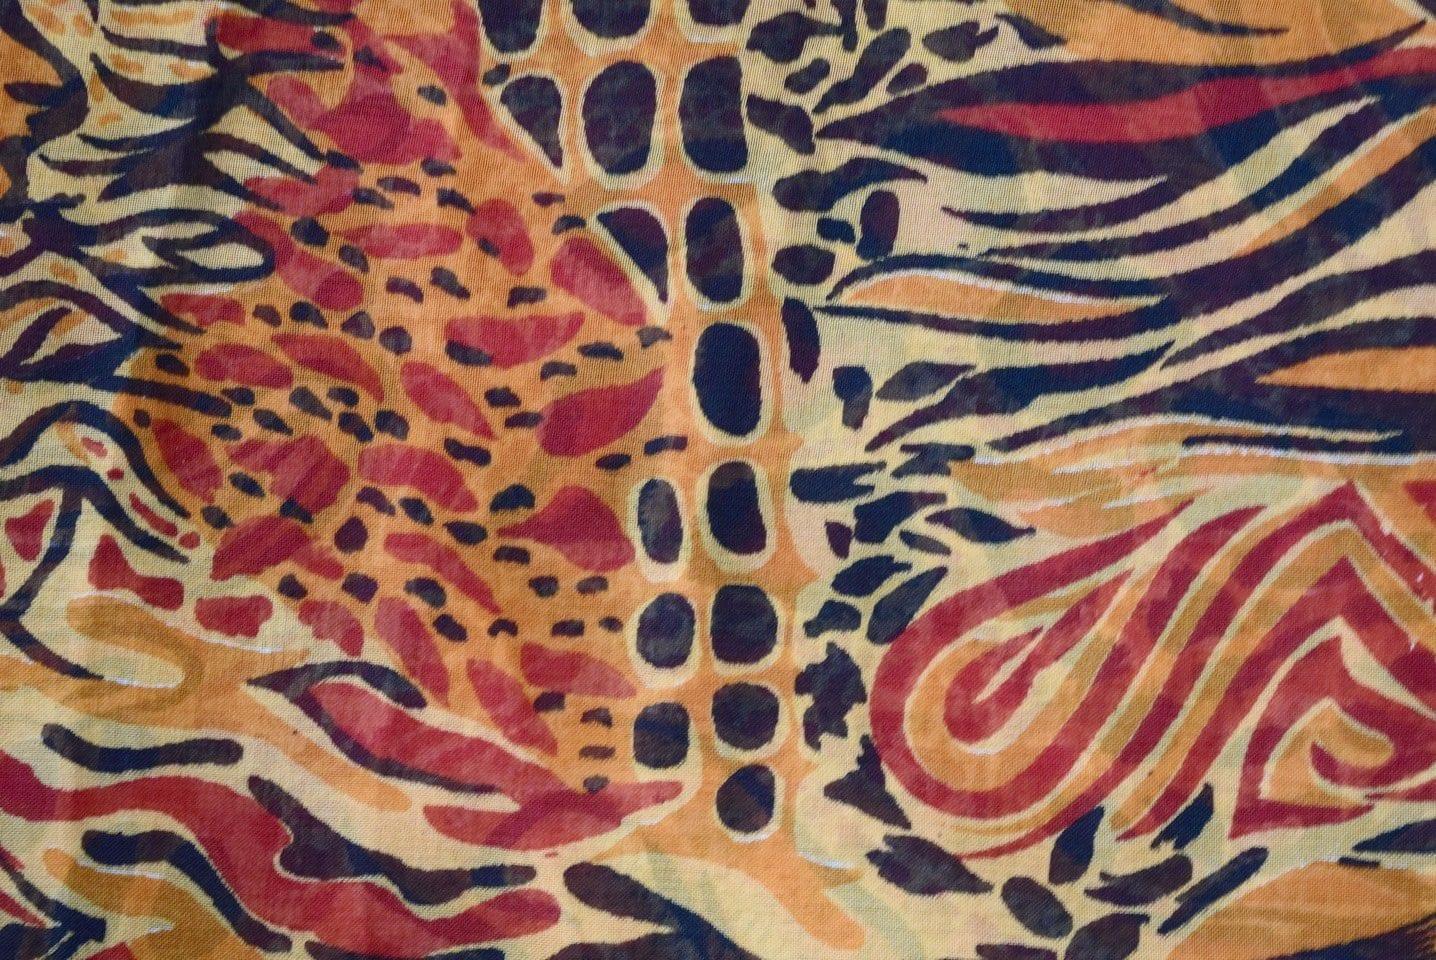 GEORGETTE PRINTED fabric for Kurti, Saree, Salwar, Dupatta GF034 1